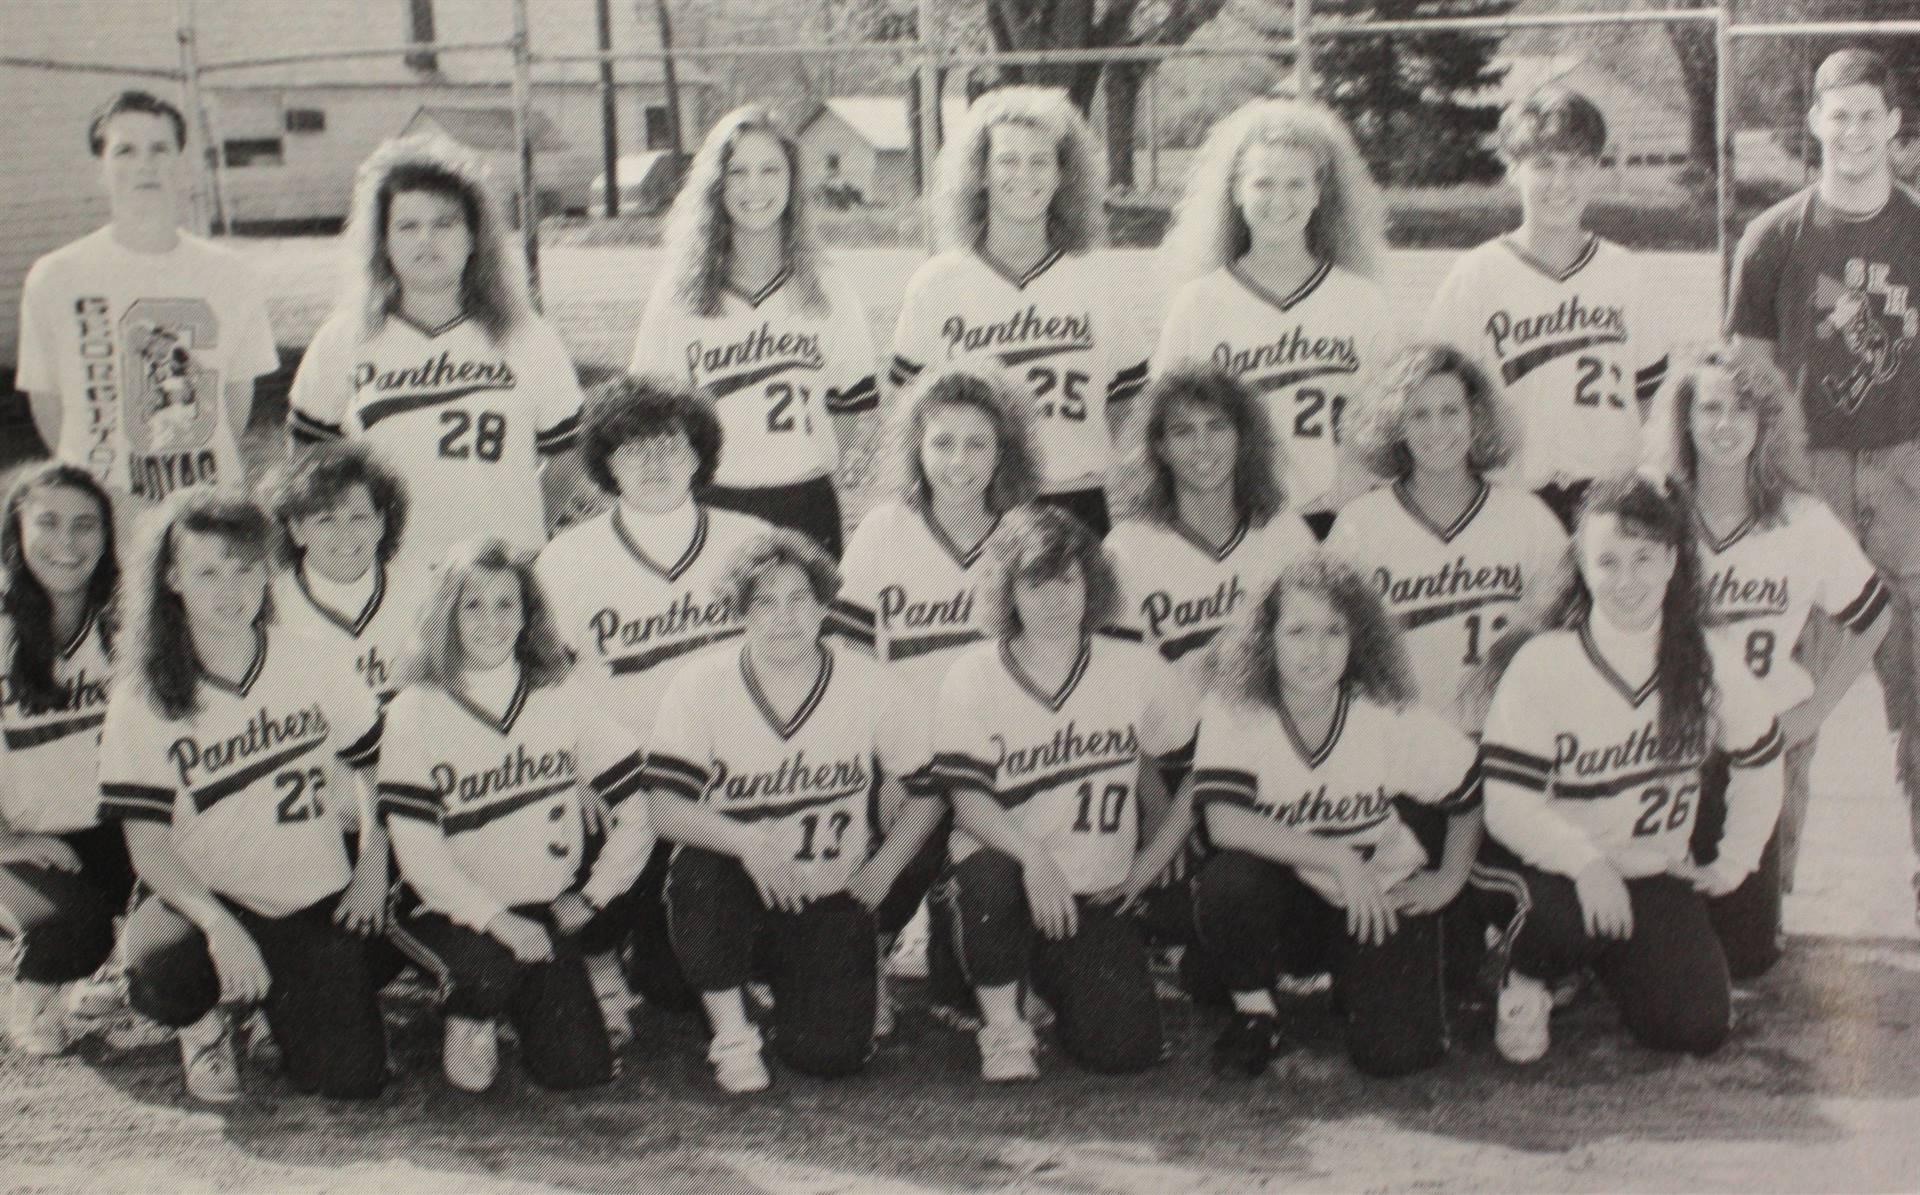 1992 Softball